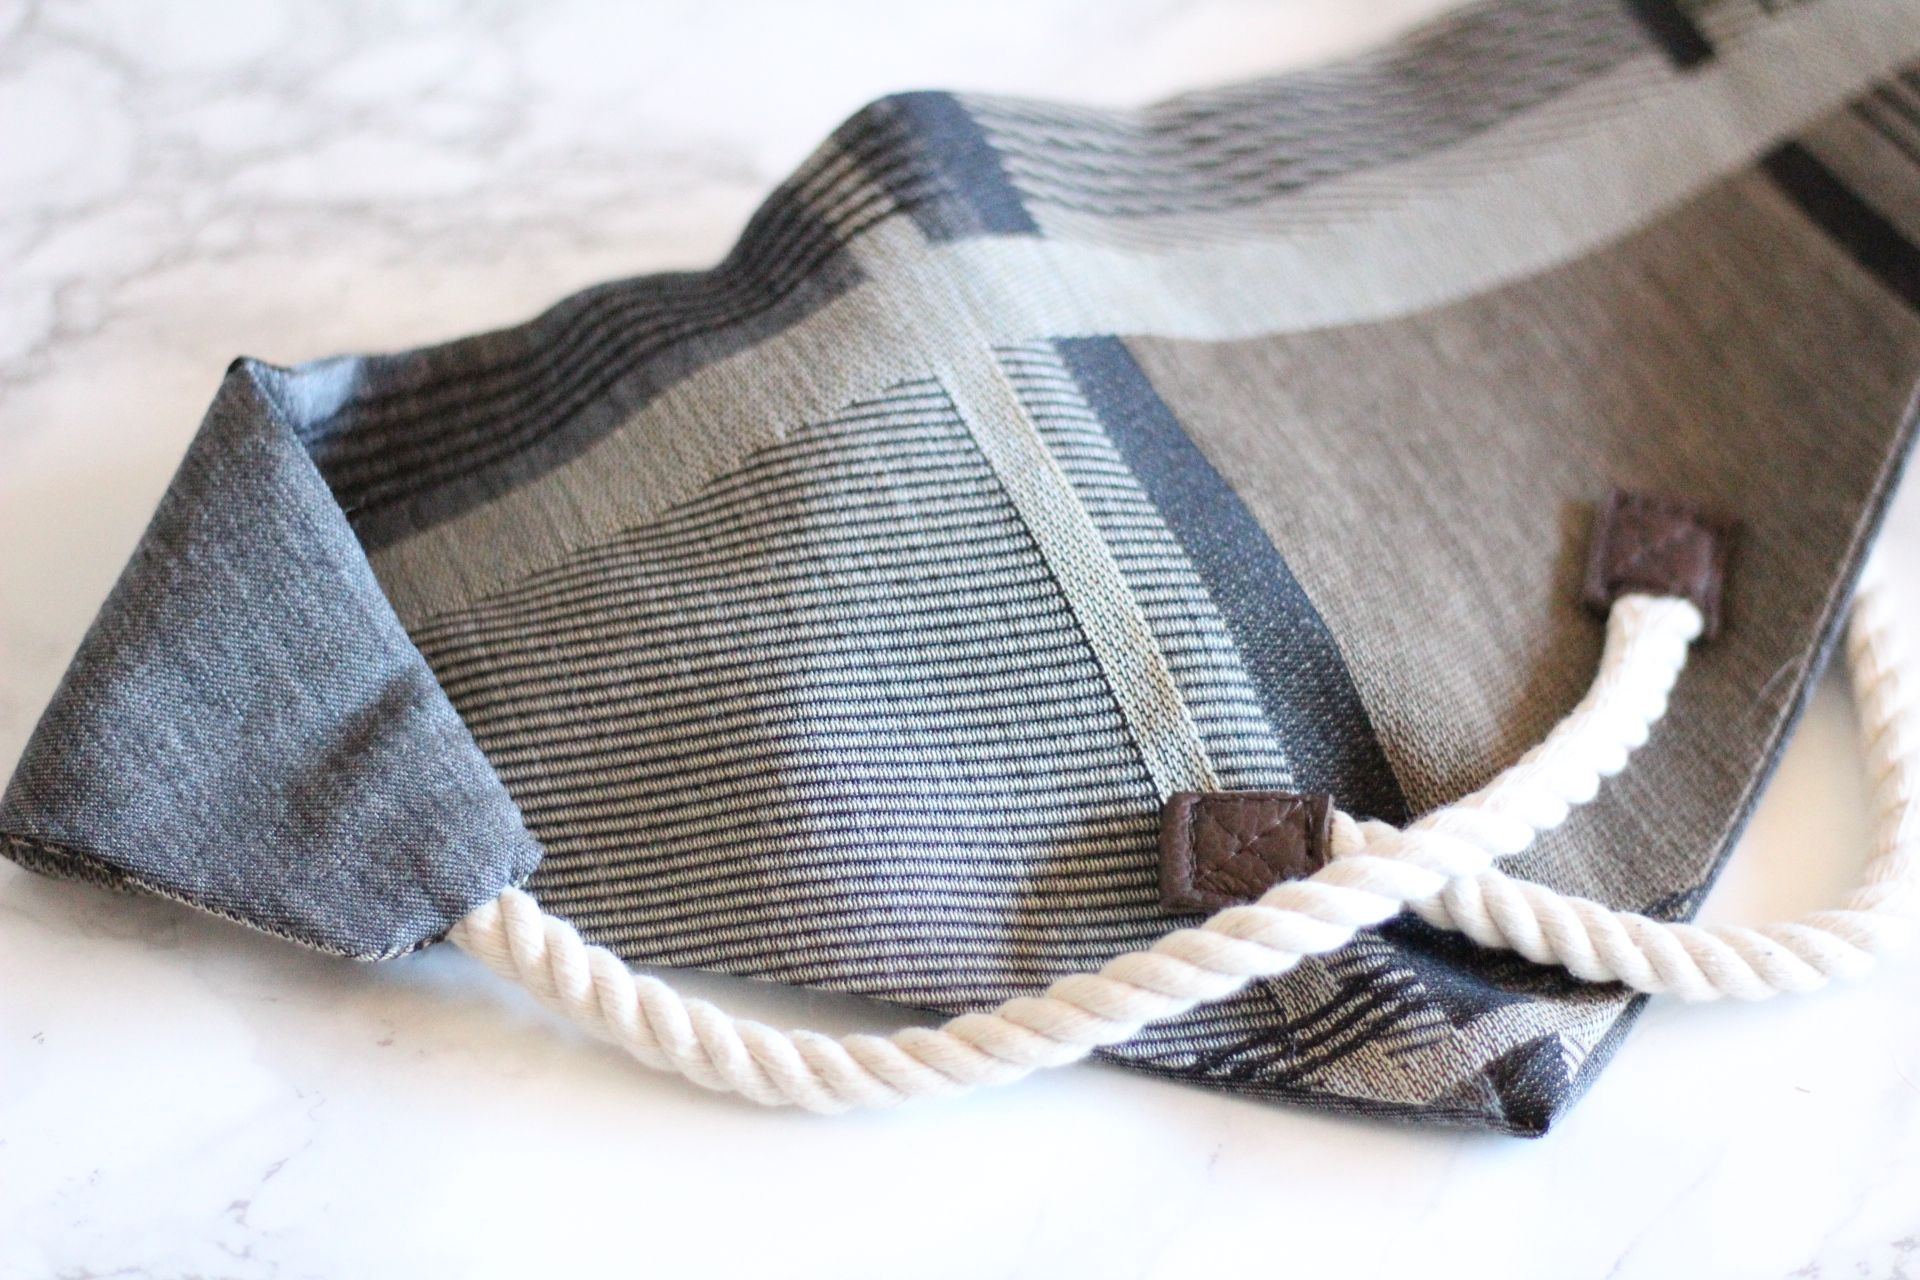 tauhalsband#tauleine#collar#leash#hundeleine#hundehalsband#edel ...